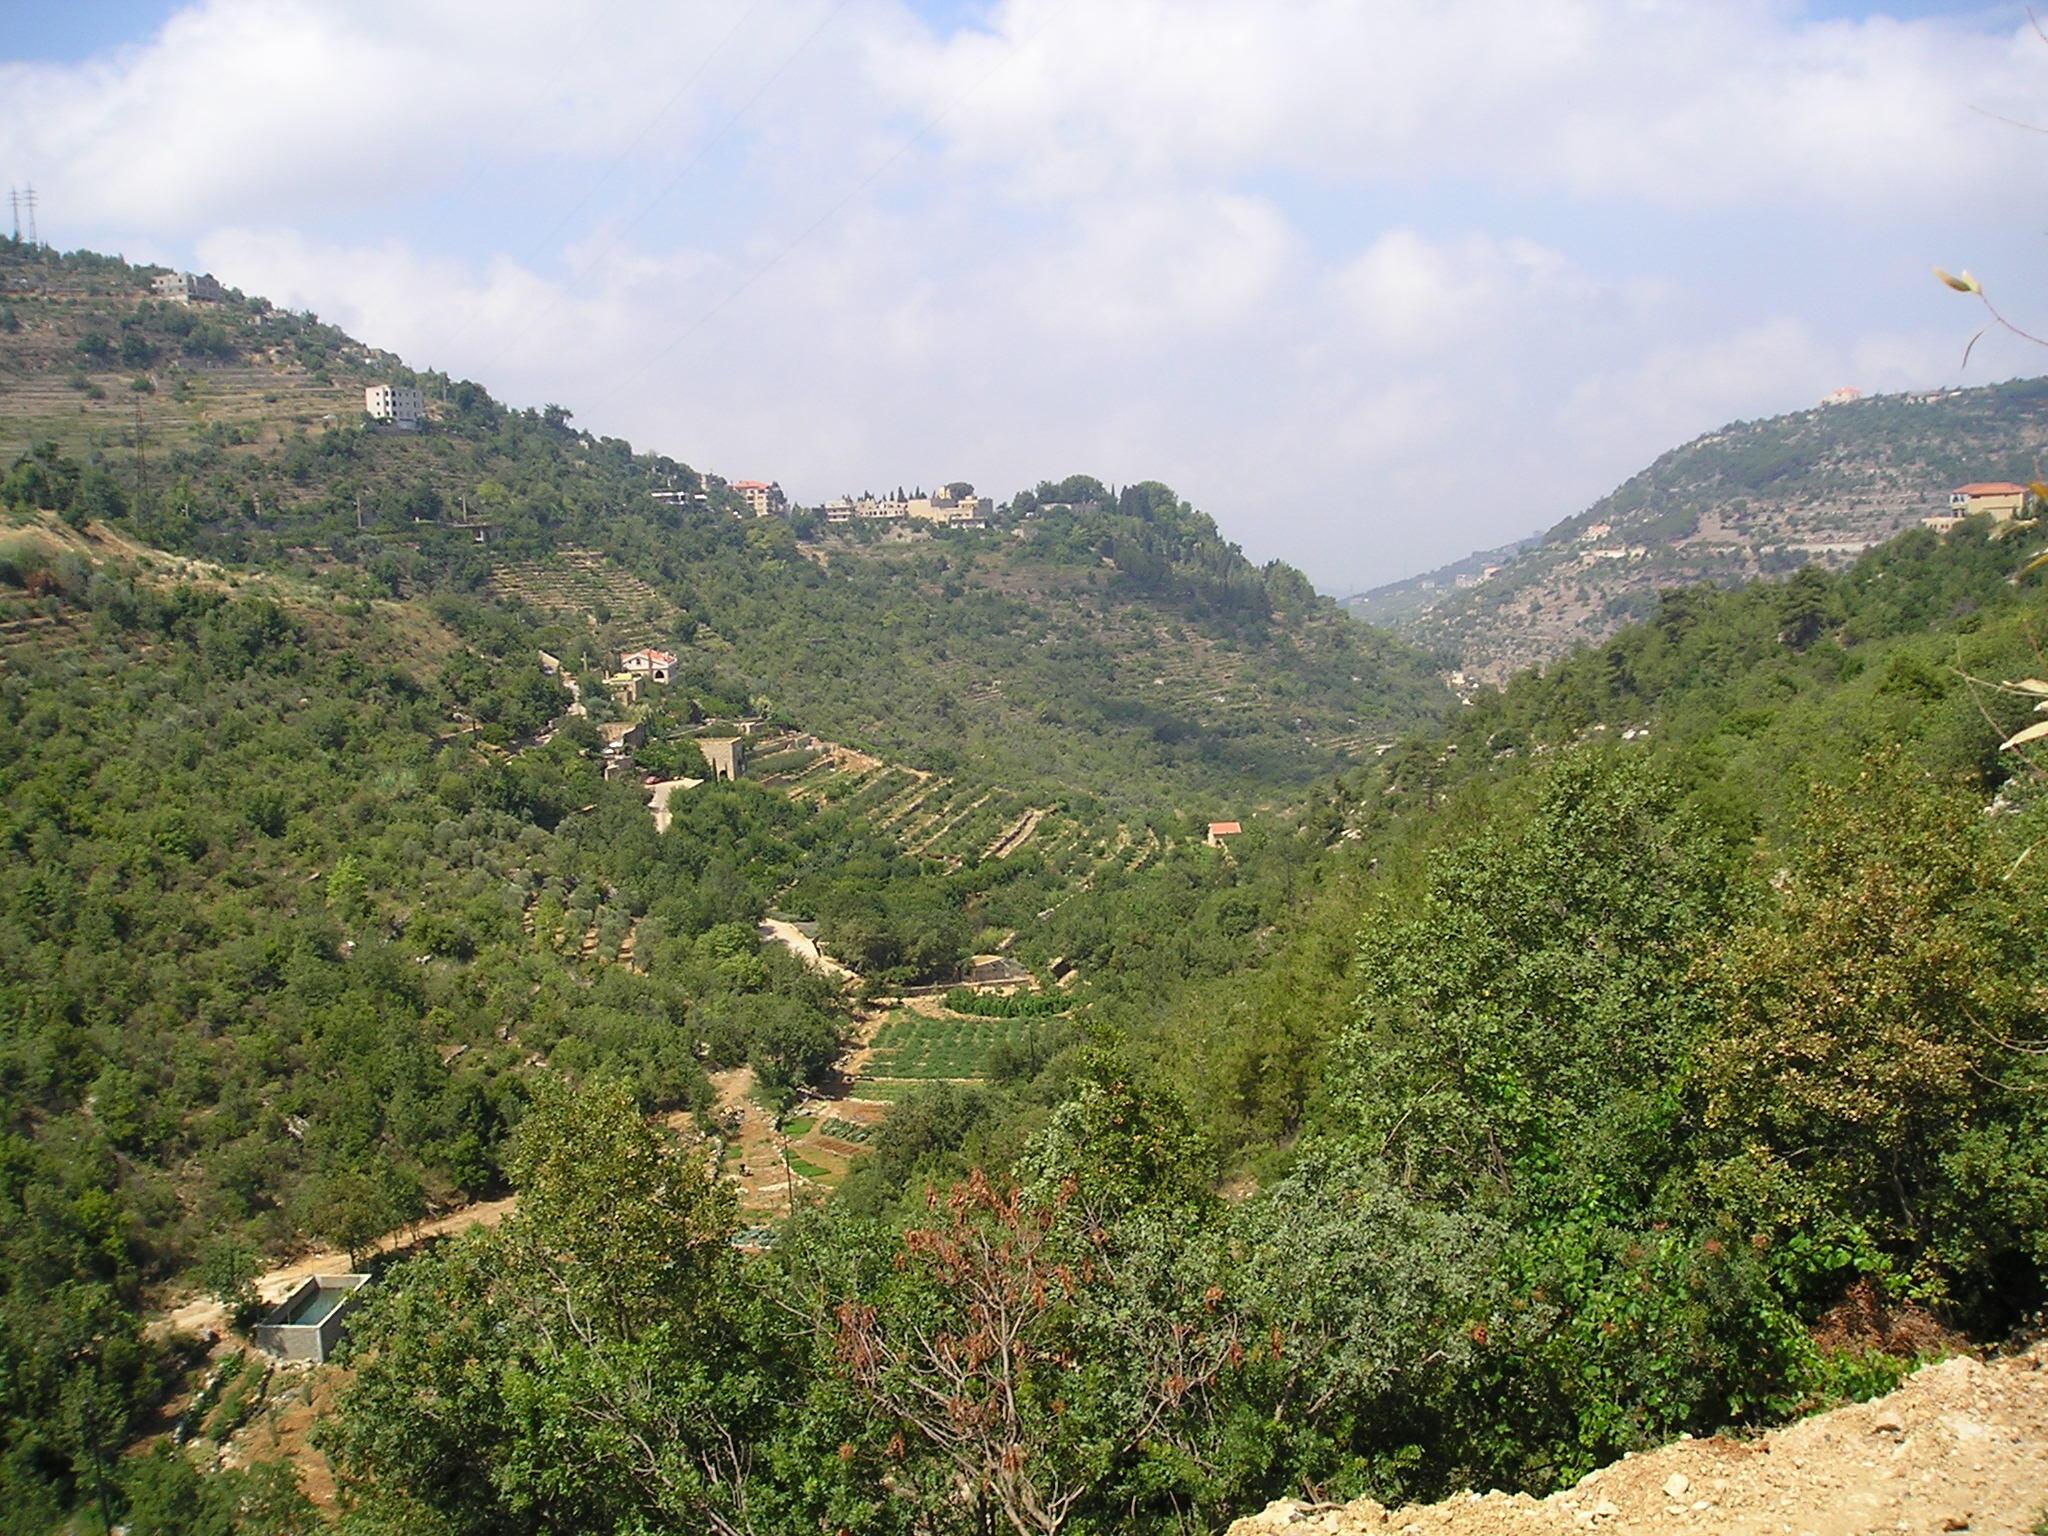 Chouf mountains in Lebanon